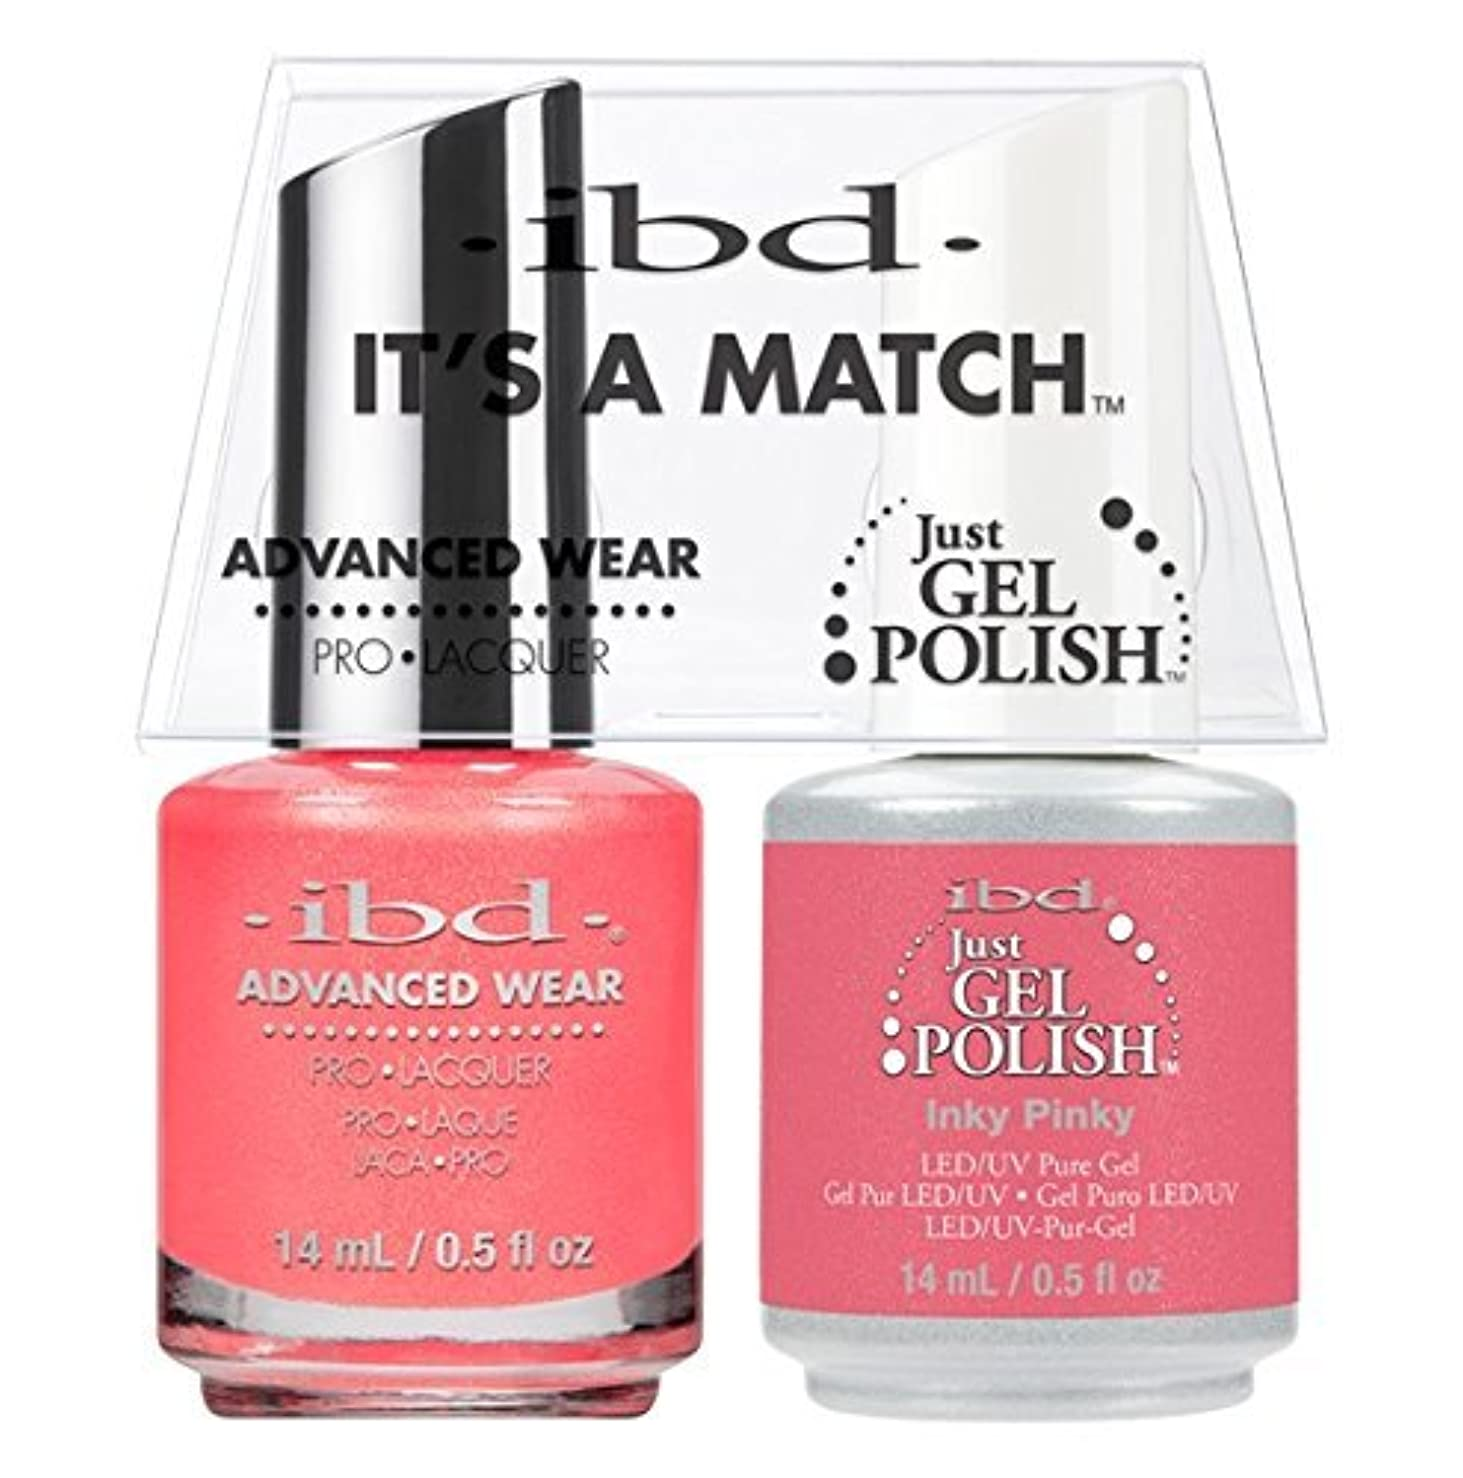 弁護人活性化第二にibd - It's A Match -Duo Pack- Inky Pinky - 14 mL / 0.5 oz Each